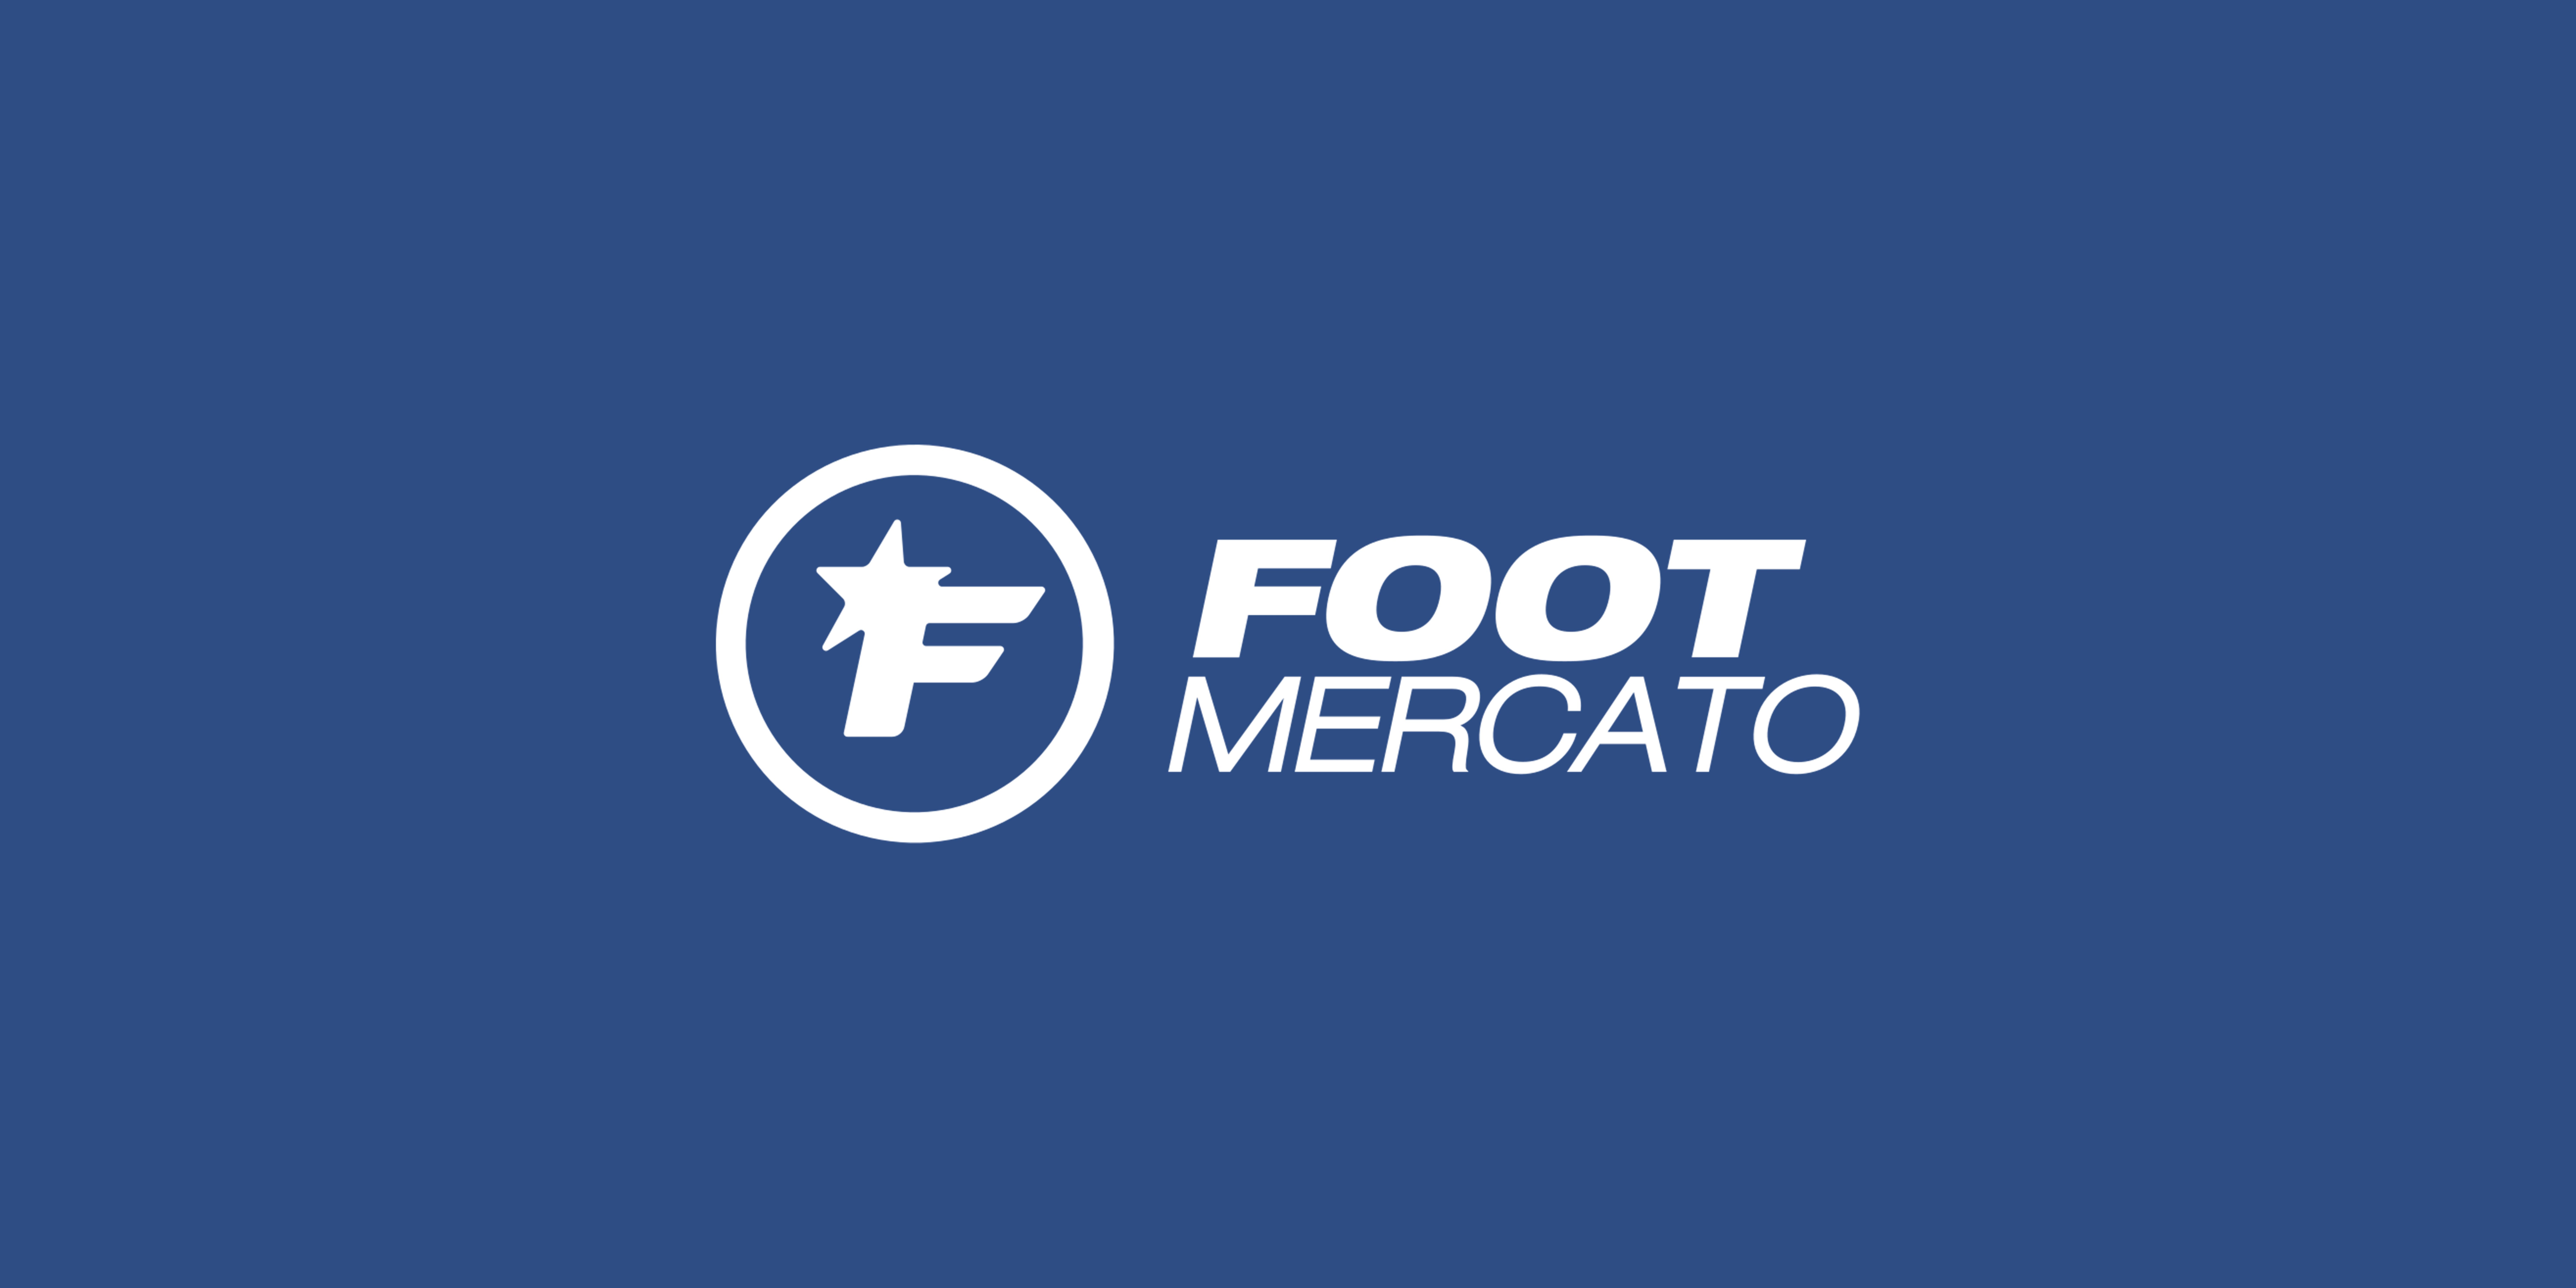 FOOT MERCATO - Application web